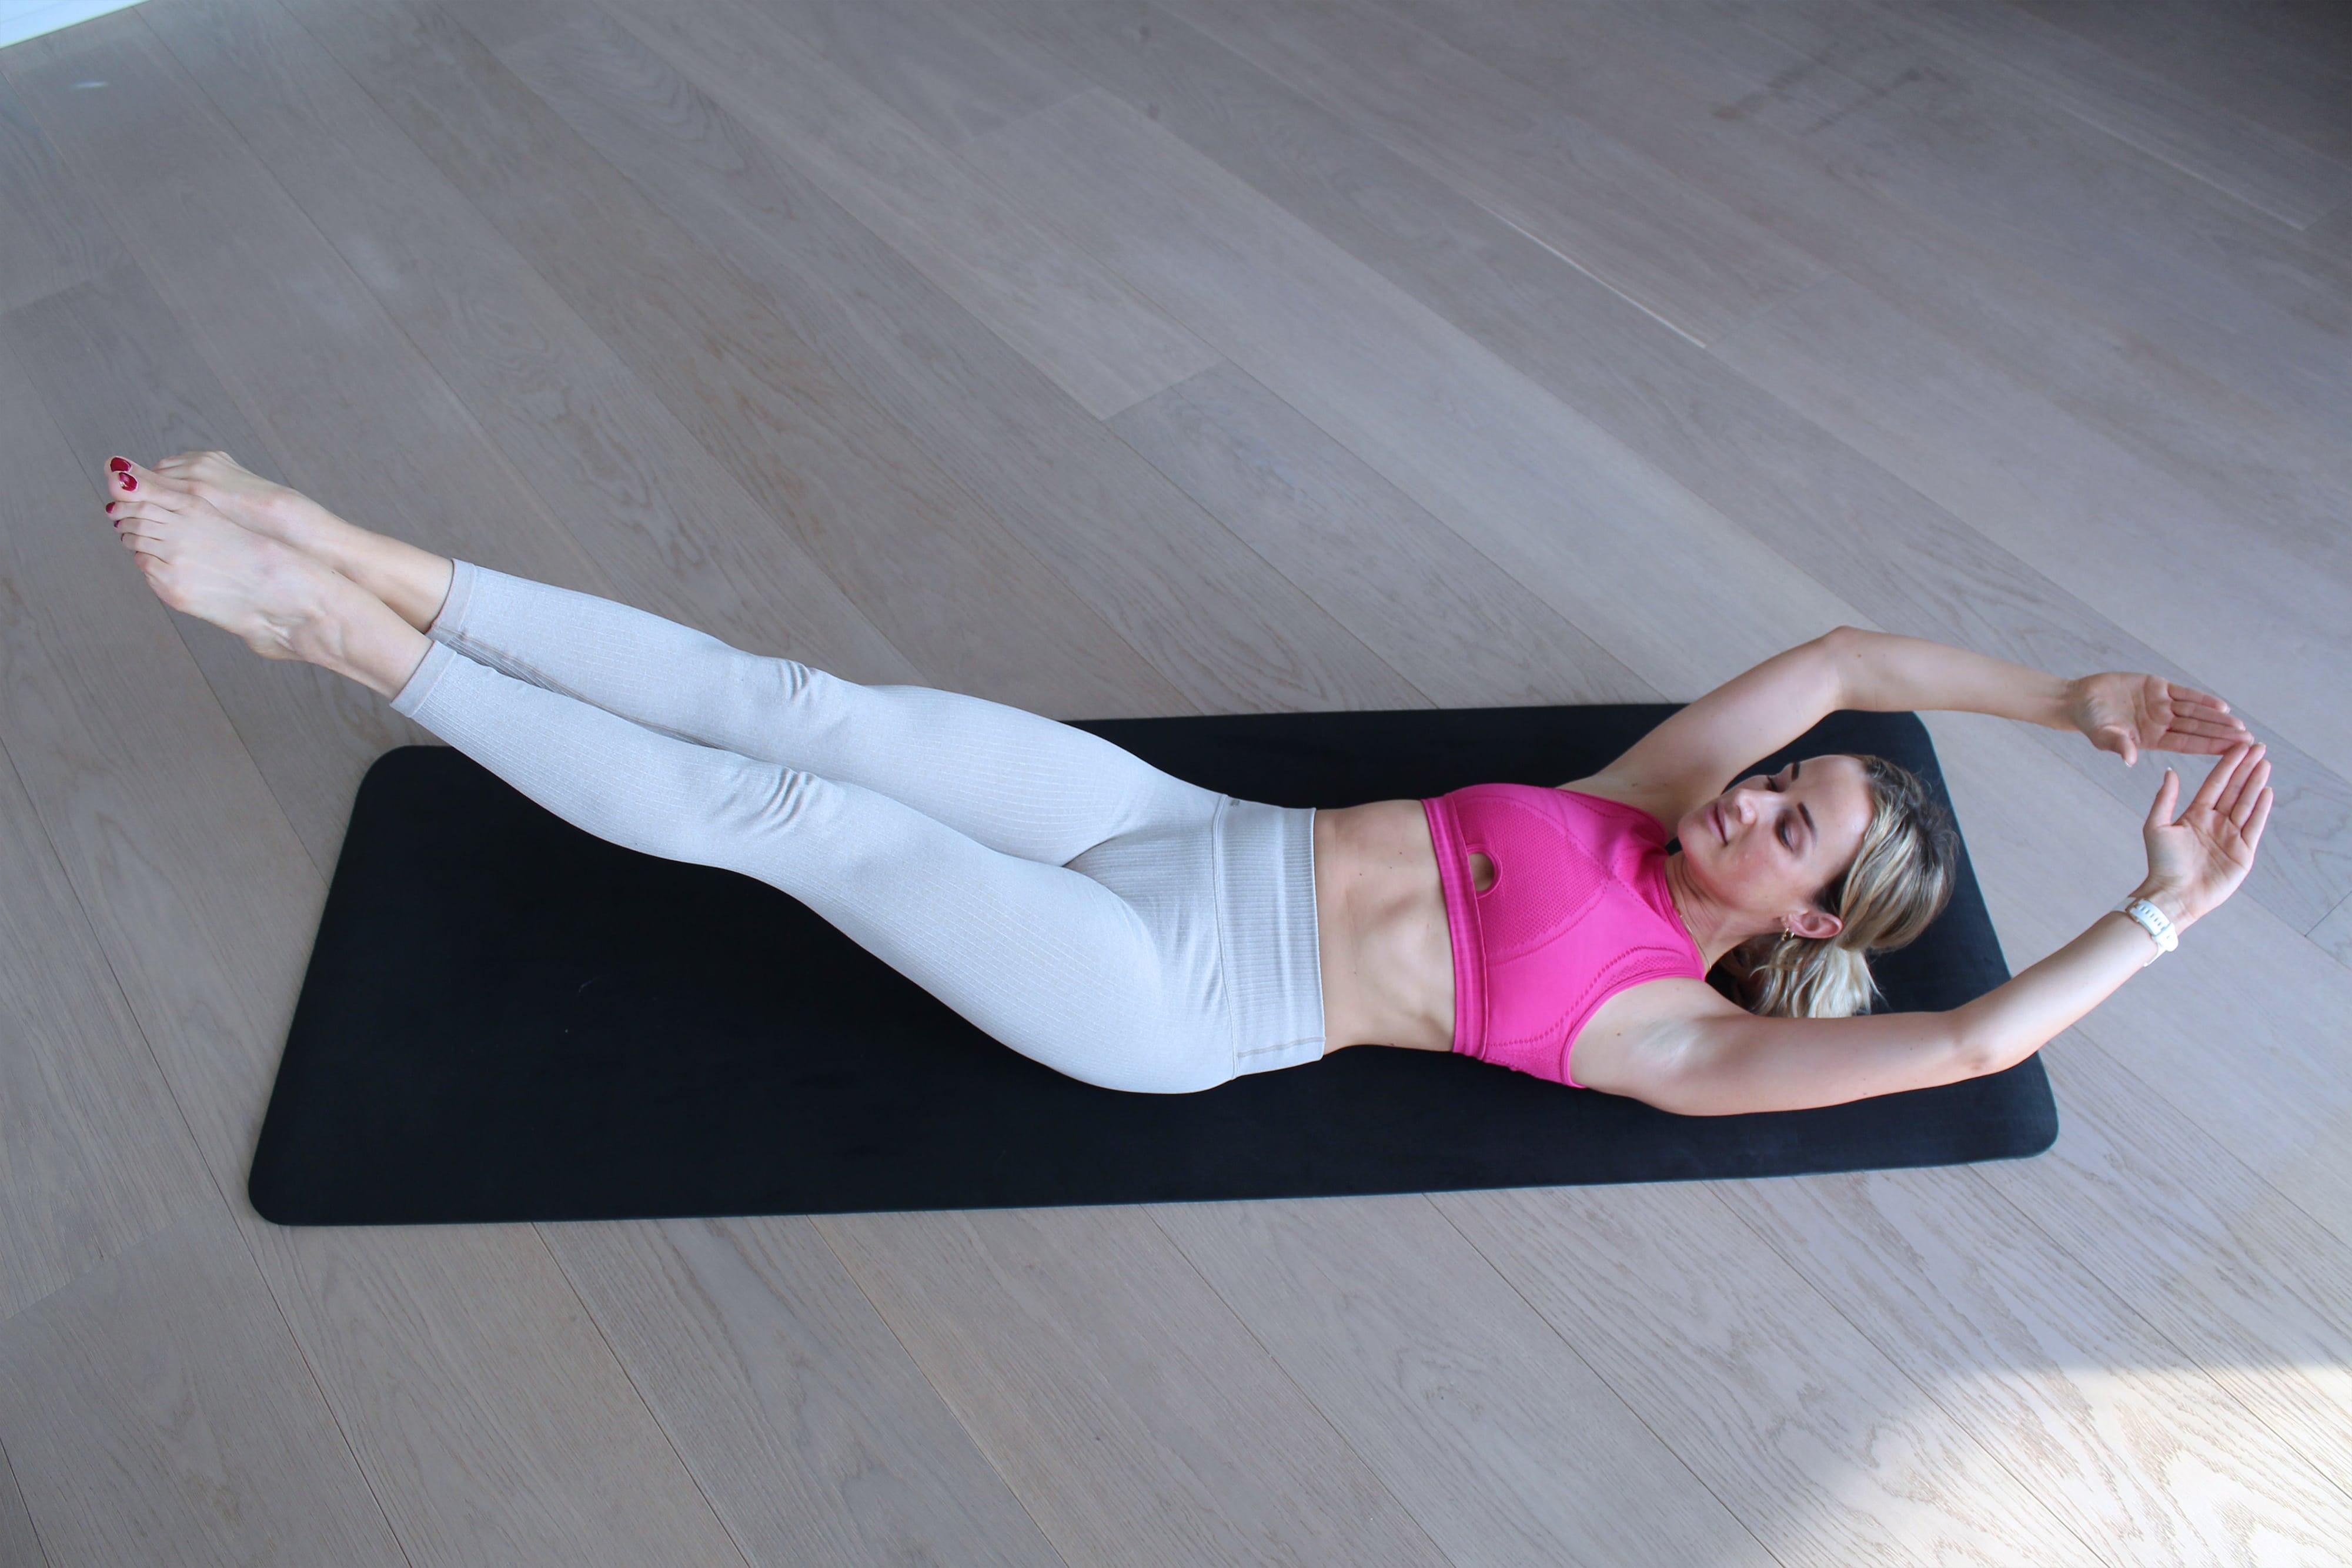 Bauch Übungen City Outlet Blog menafit Fullbody Crunch gestreckt